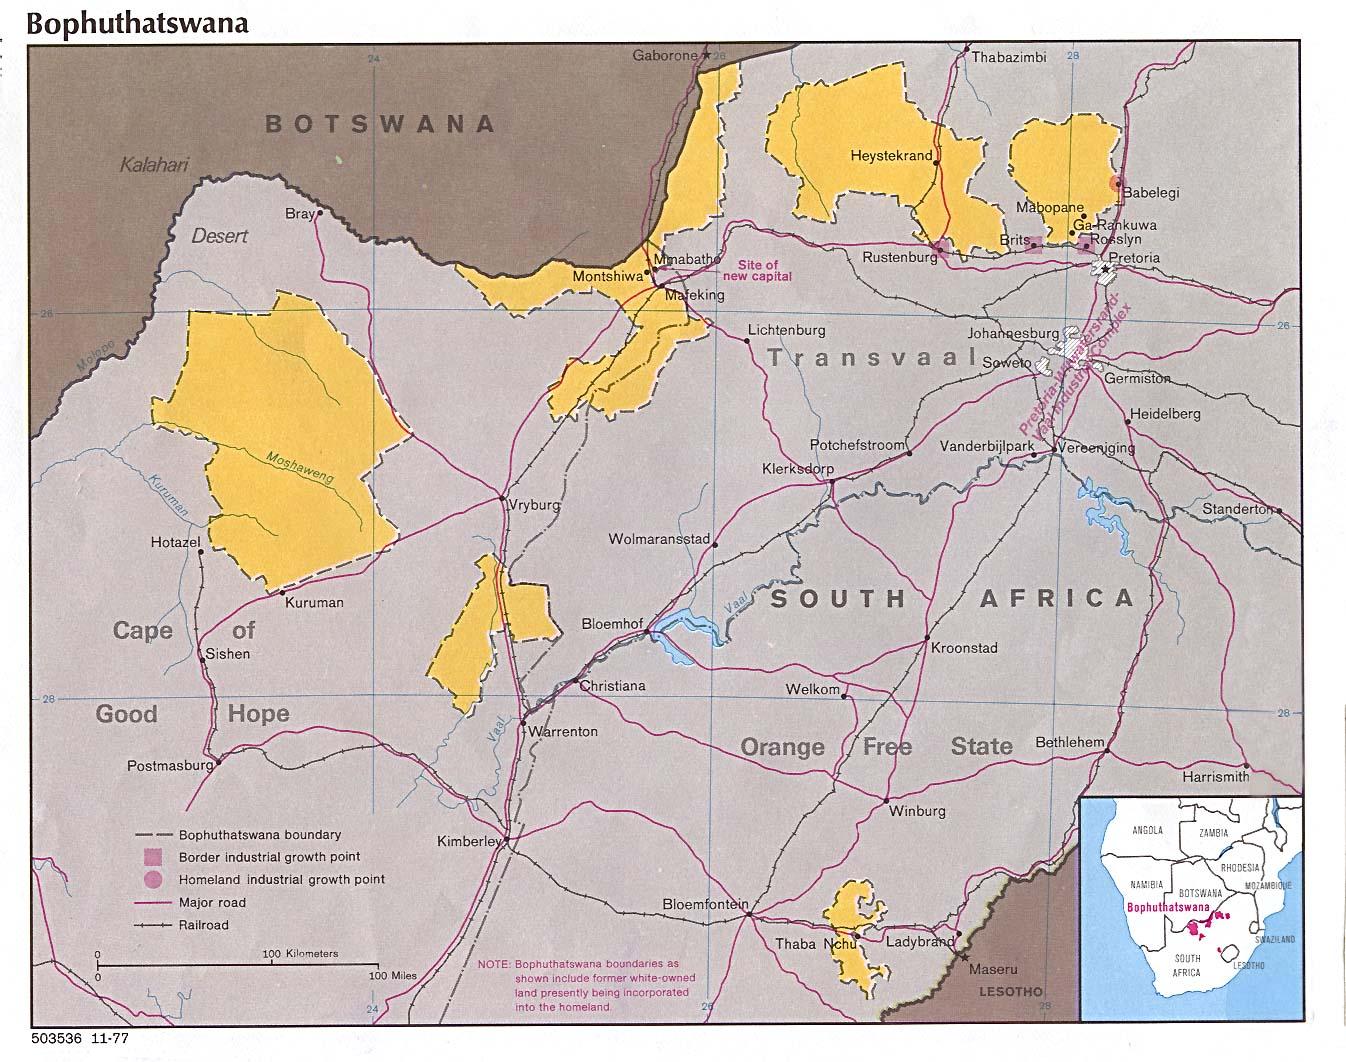 Bophuthatswana Economic Activity Map 1977